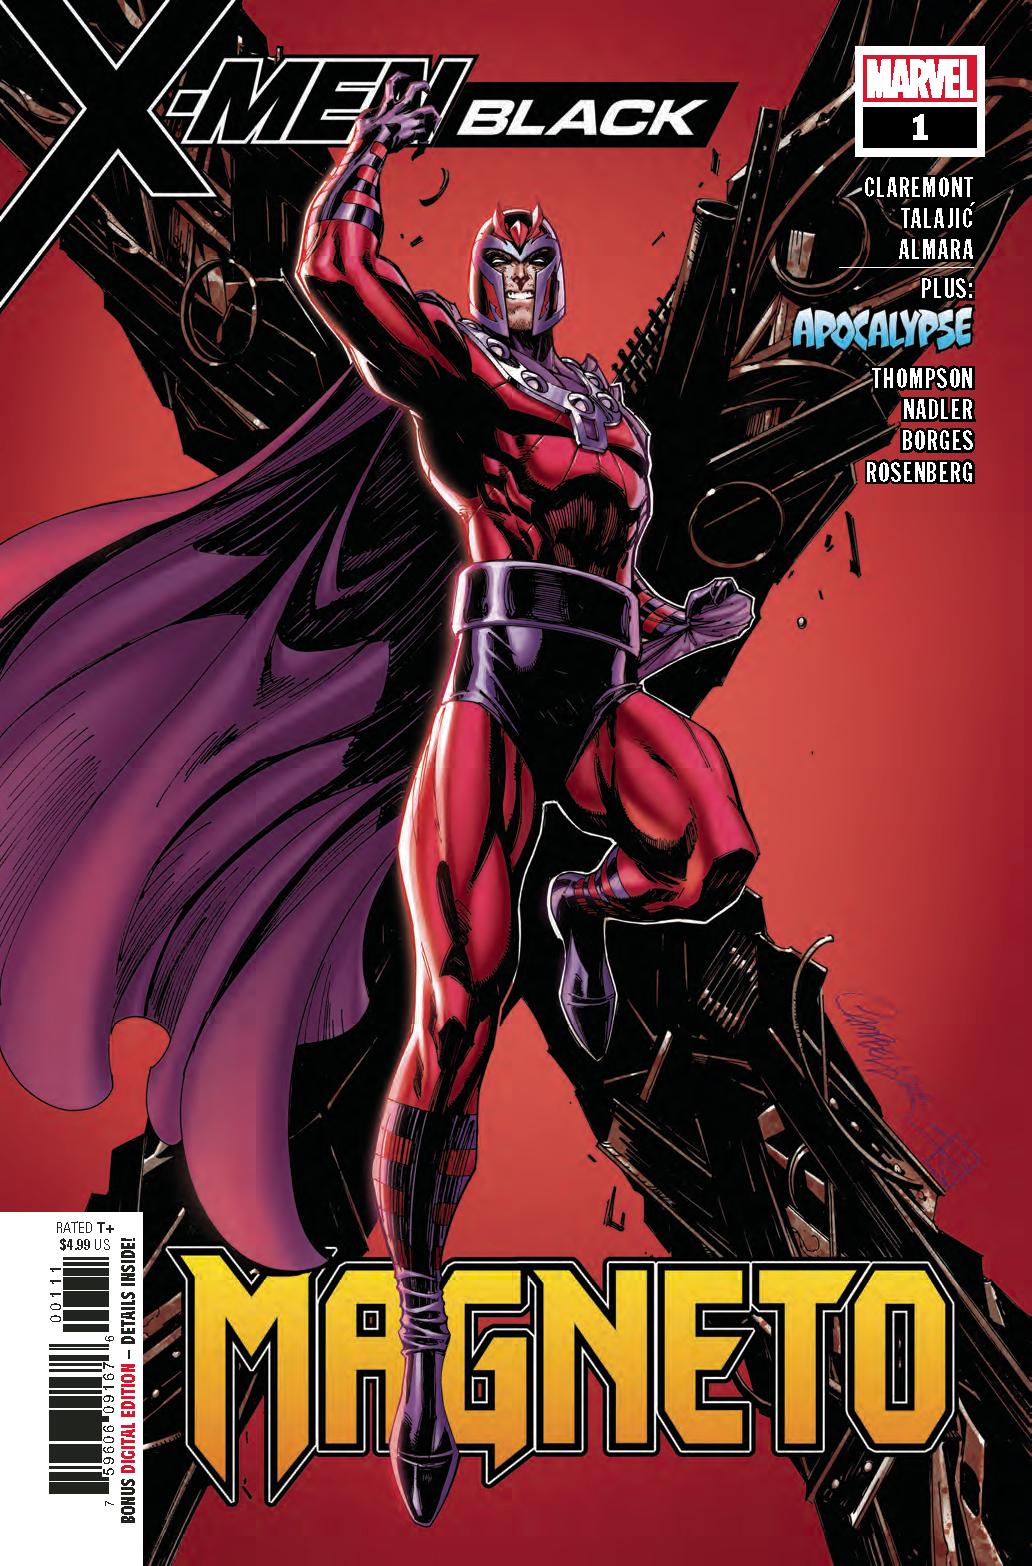 X-Men: Black - Magneto Vol 1 1